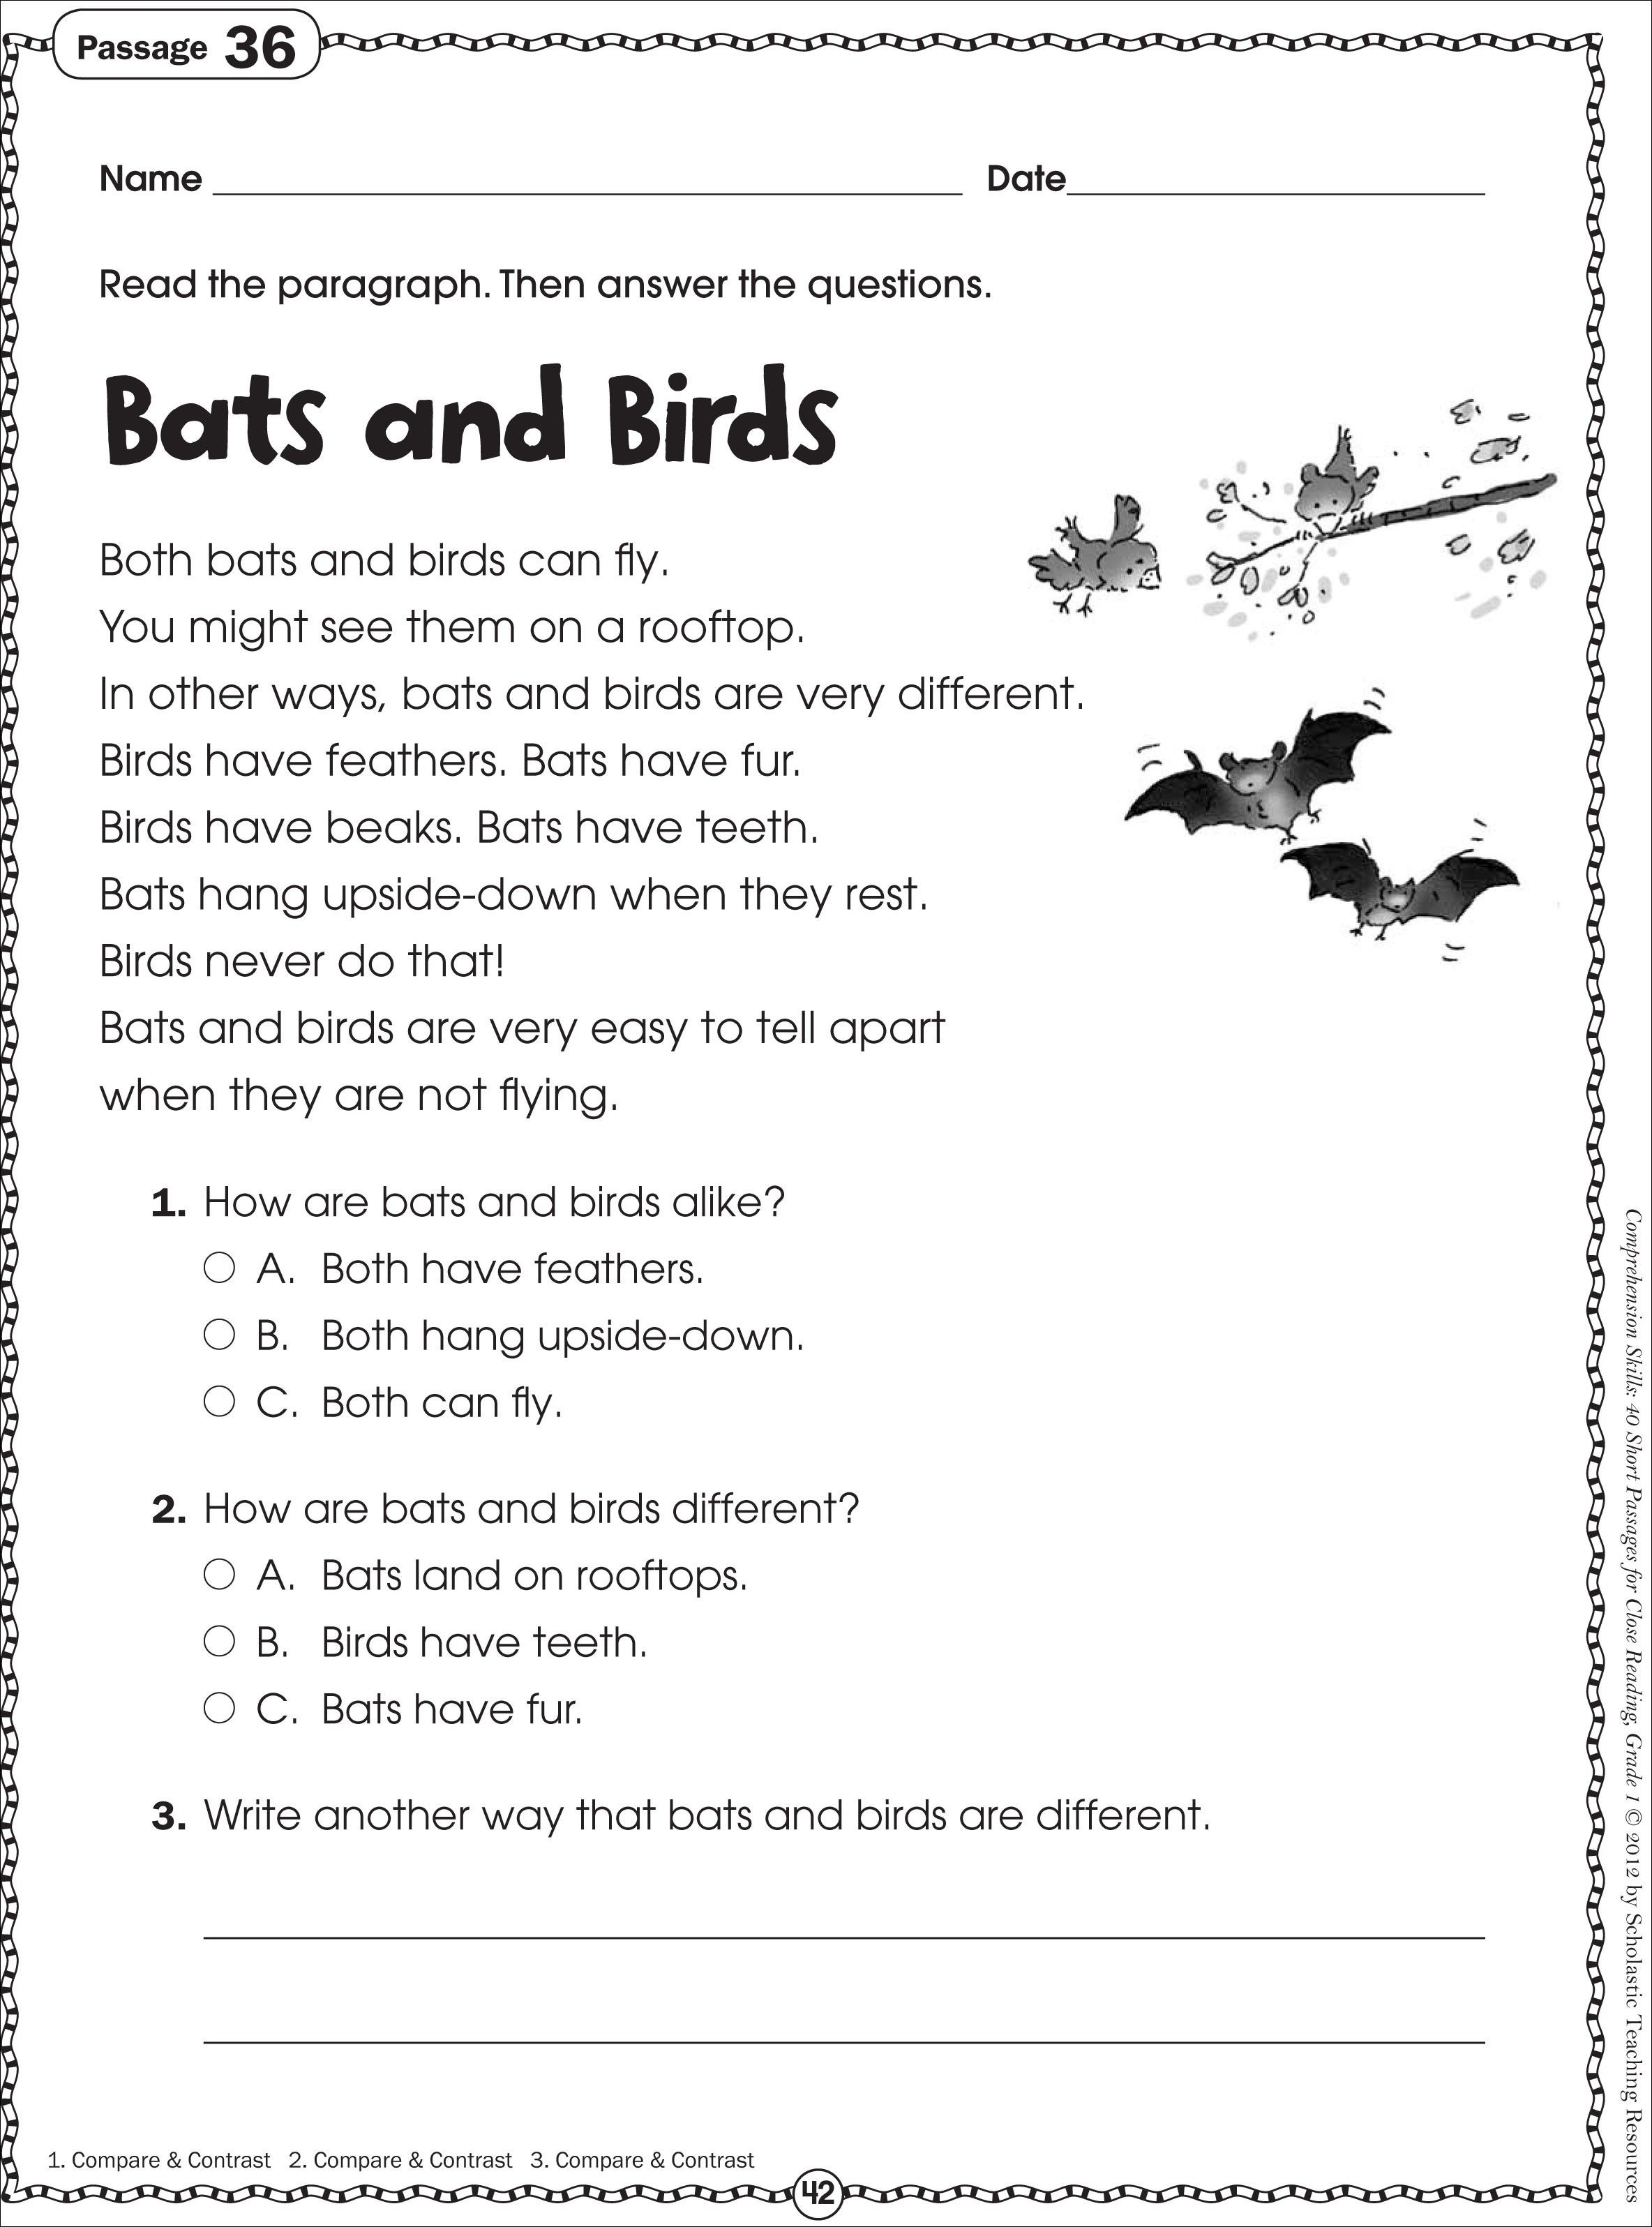 Free Printable Reading Comprehension Worksheets For Kindergarten - Free Printable Reading Passages For 3Rd Grade